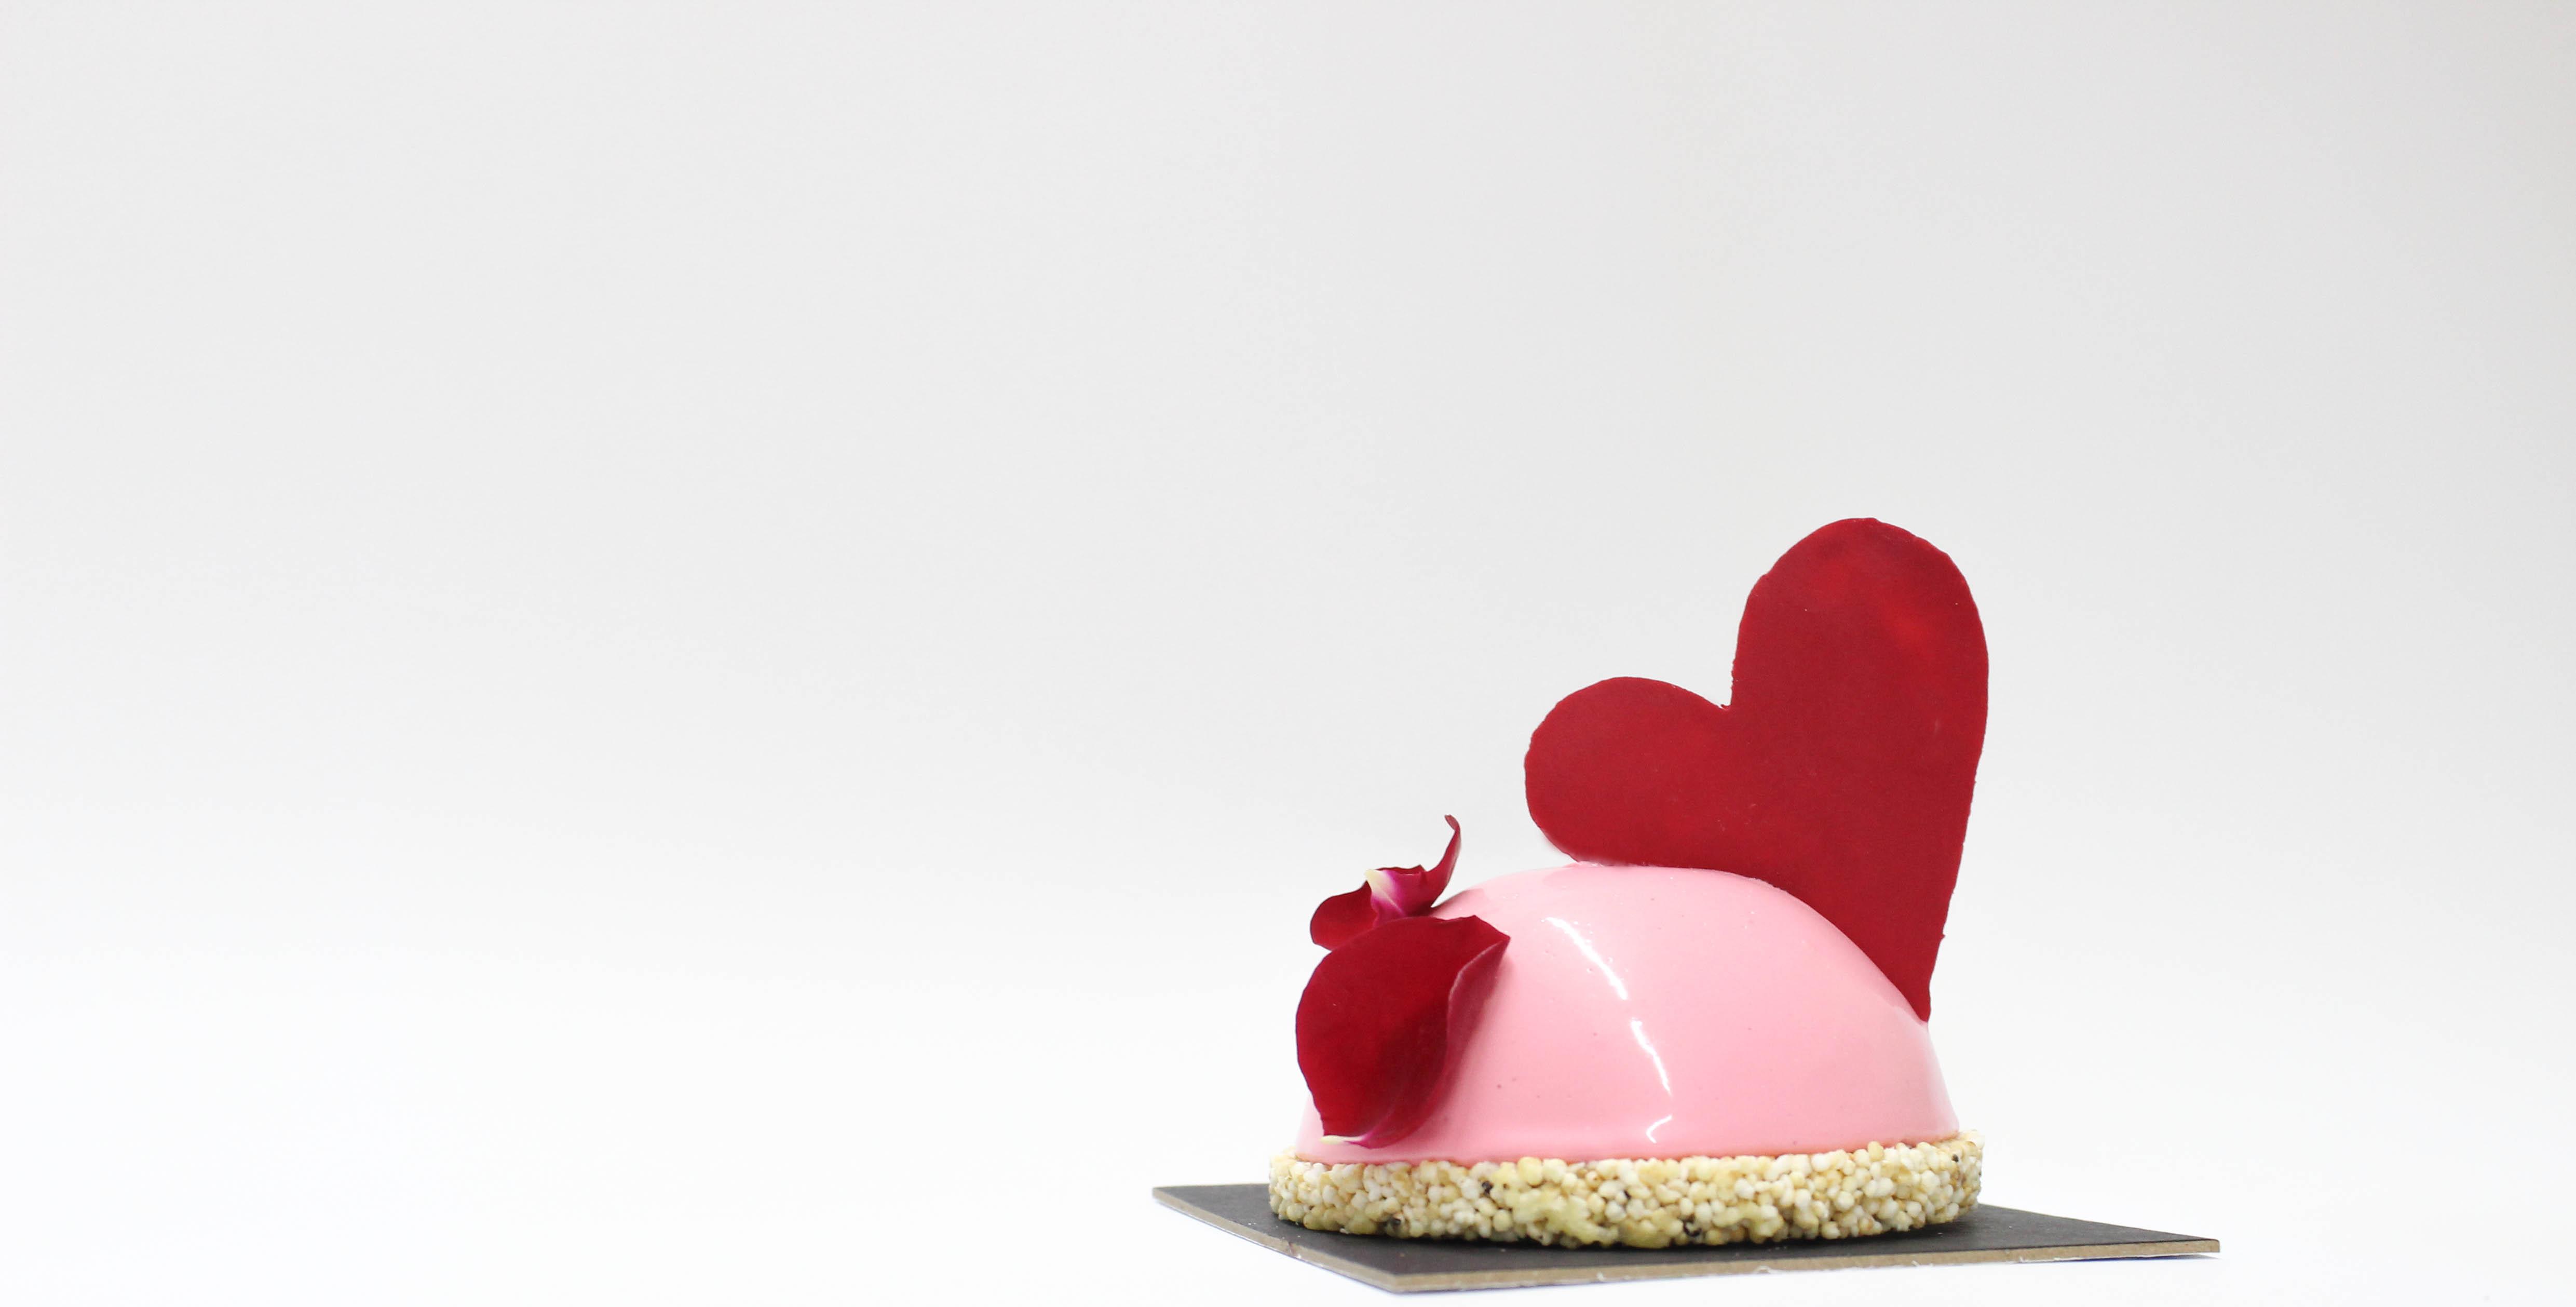 Julietta (Edición San Valentín)